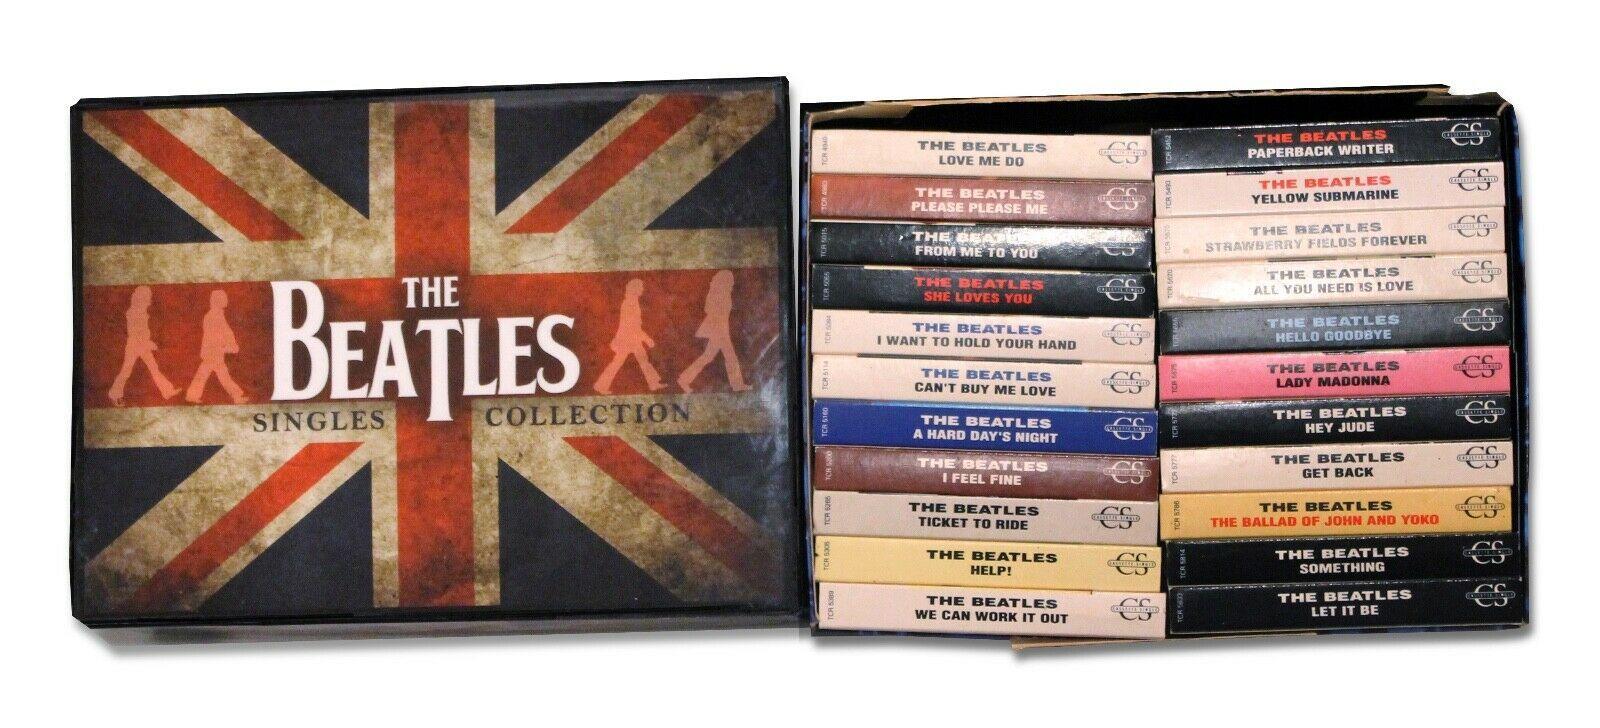 Beatles The Beatles Singles Collection 22 Uk Cassette Box Set Parlophone The Beatles Help Beatles Singles The Beatles